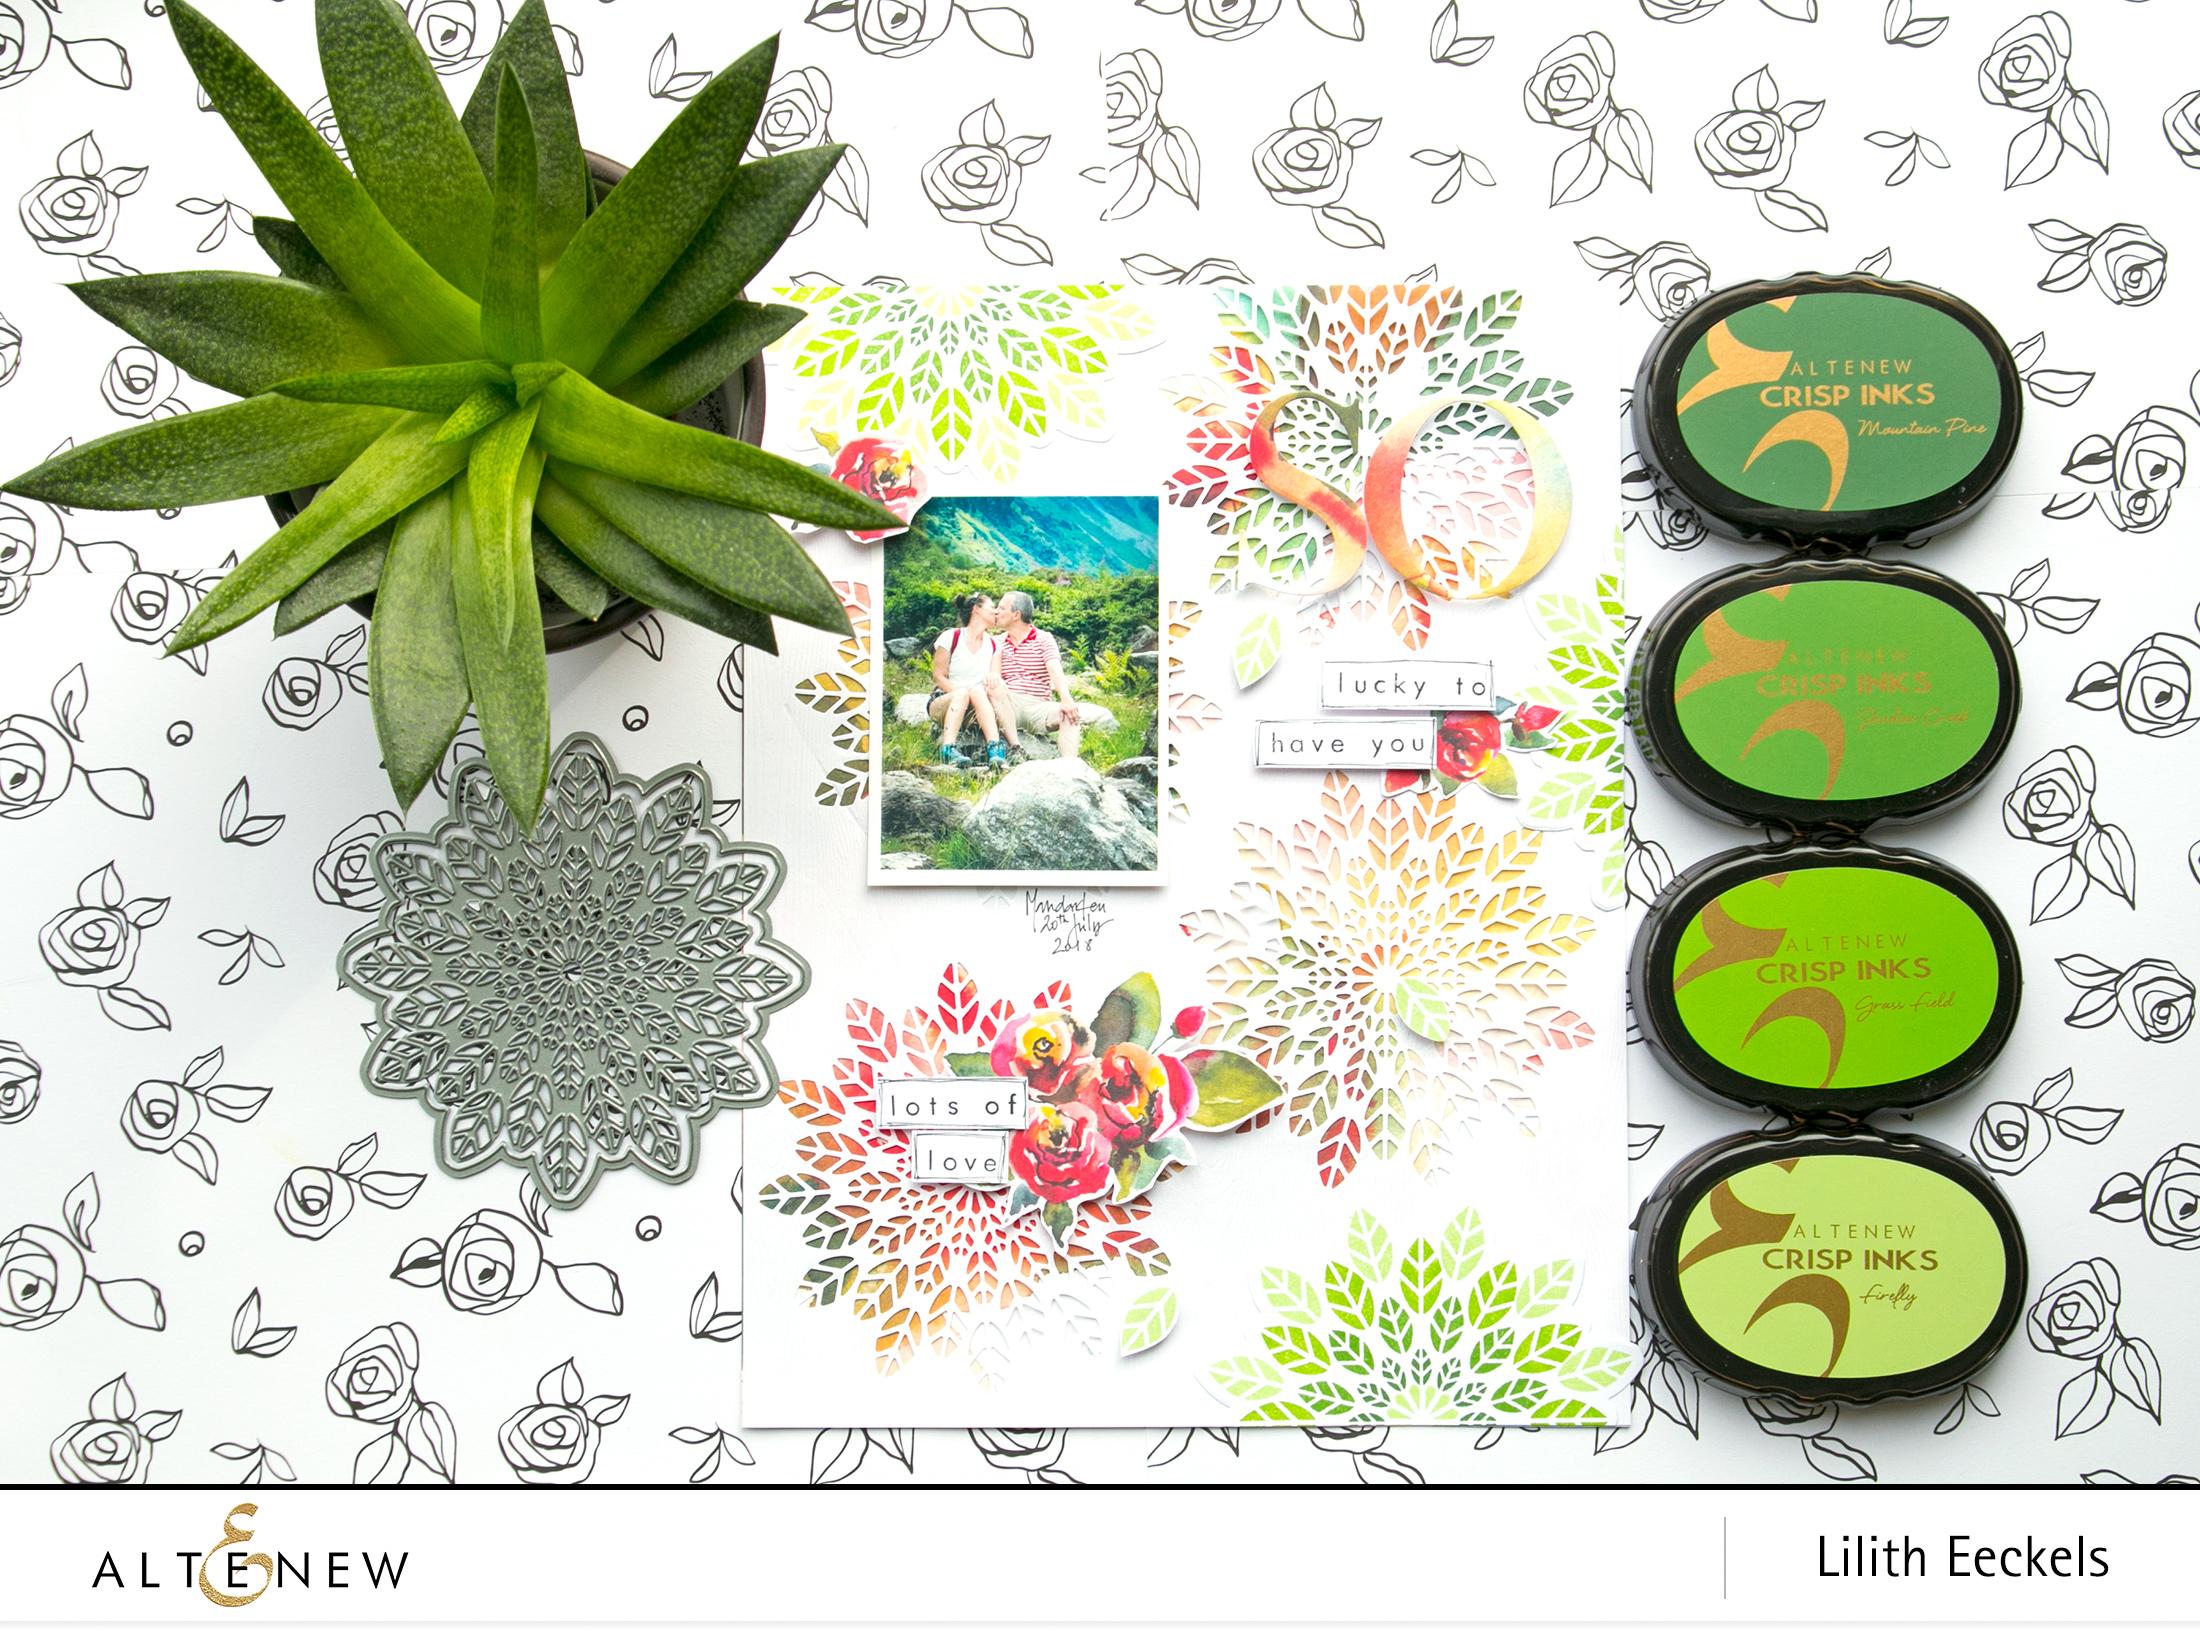 Altenew Scrapbook Beautiful Inspiring Scrapbook Projects